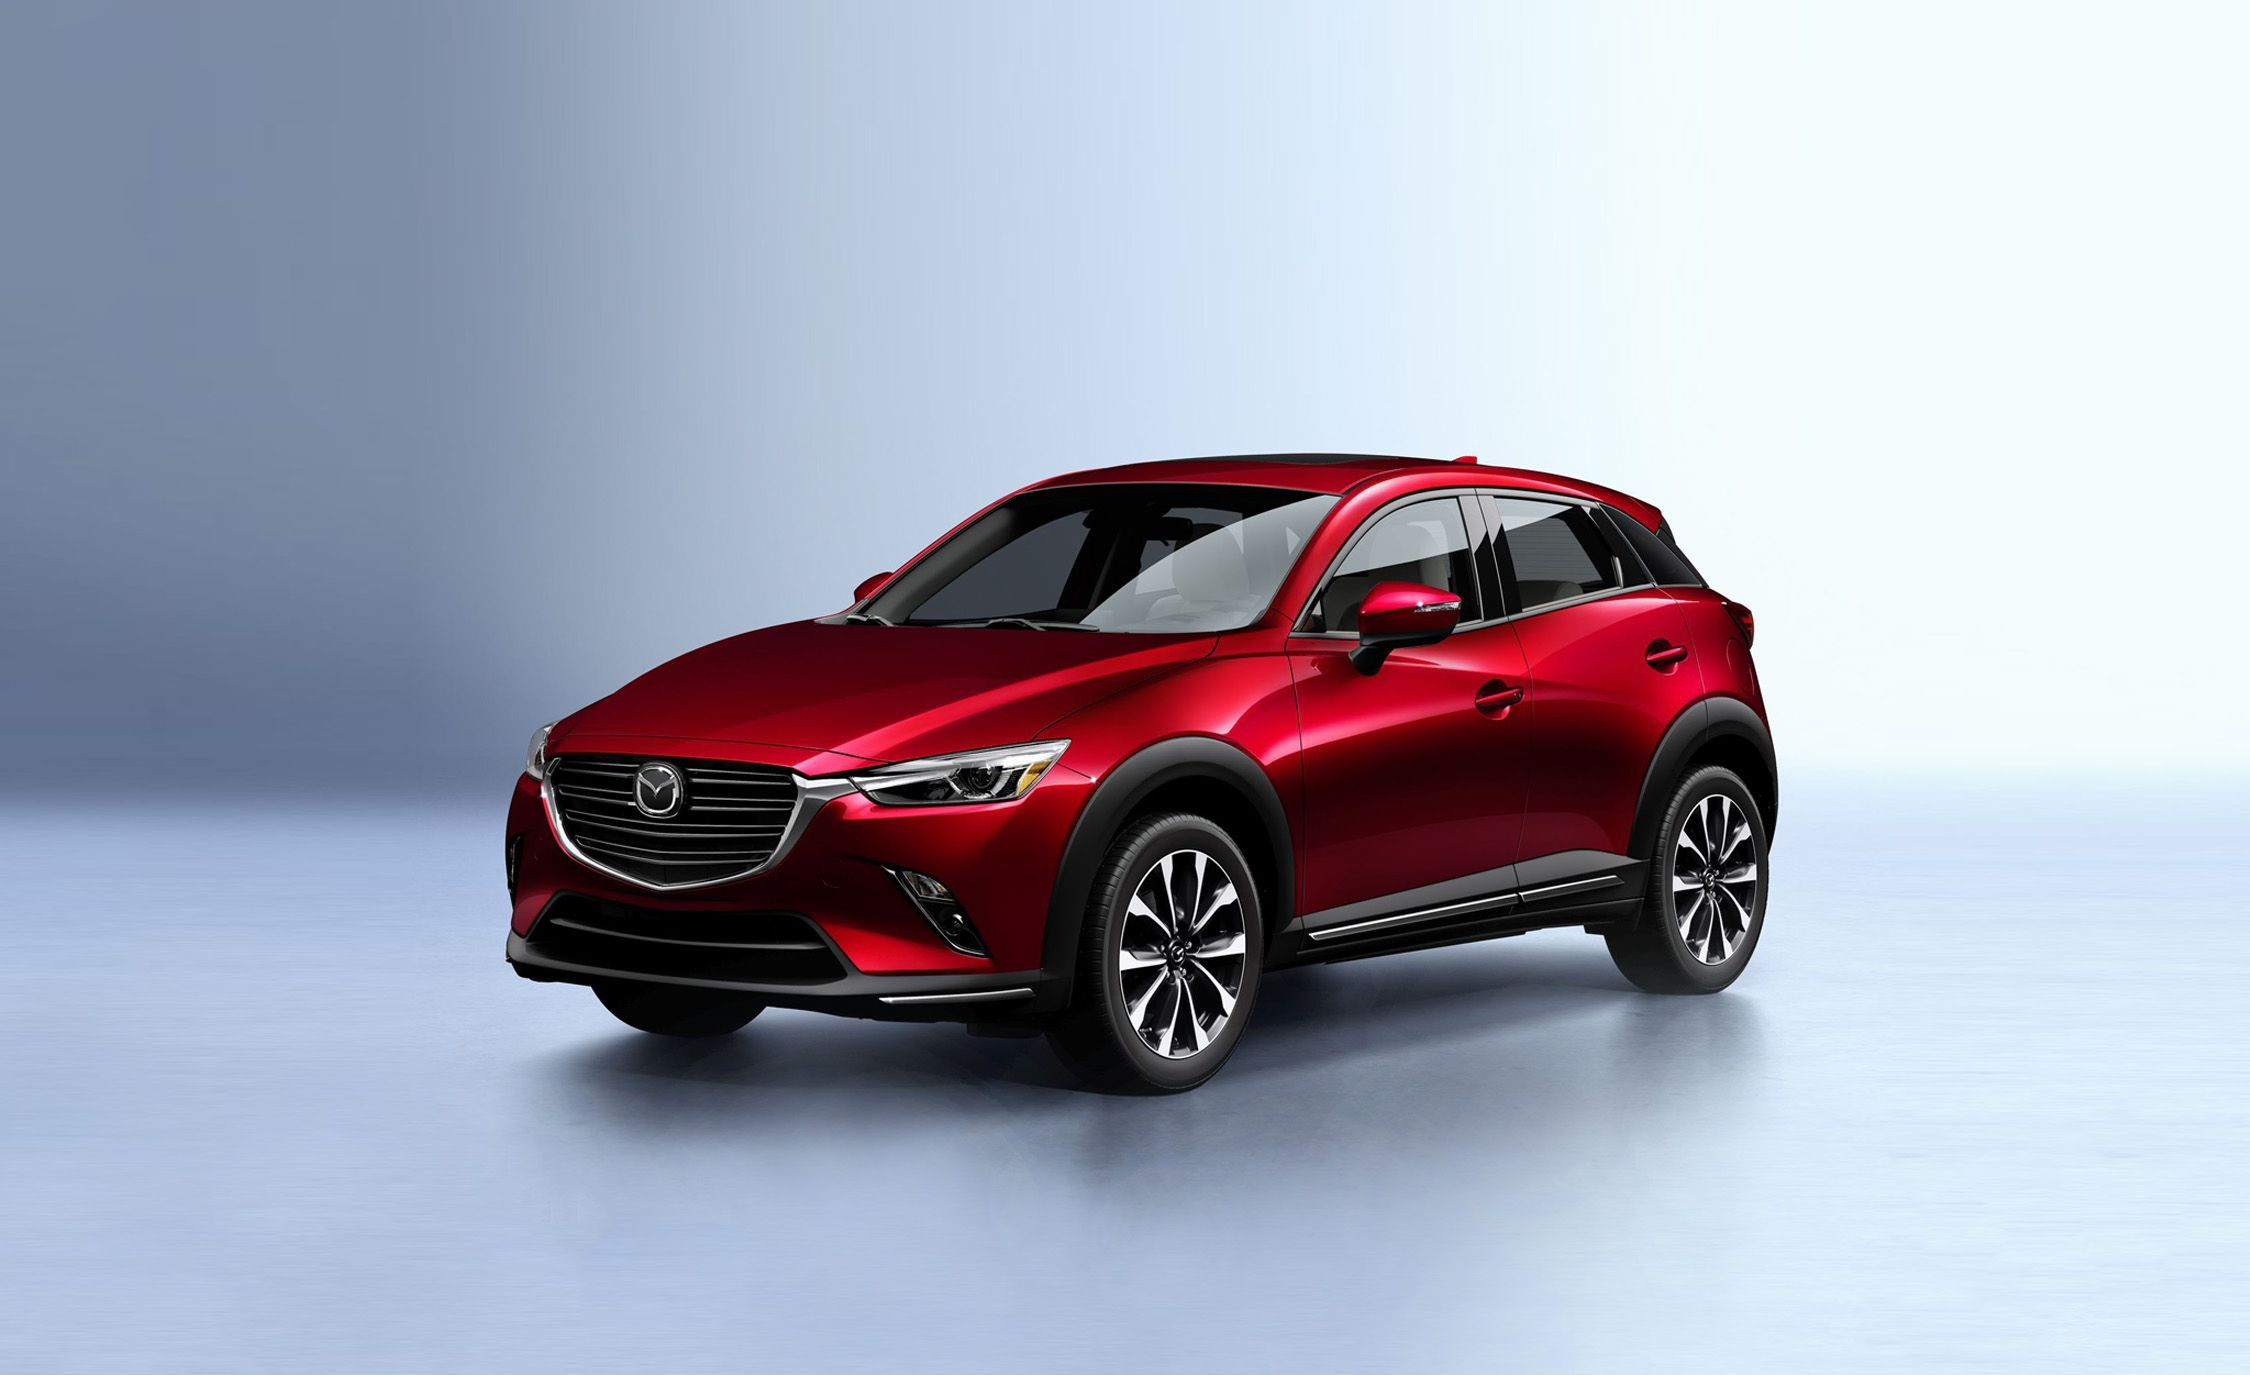 Kelebihan Kekurangan Mazda Cx 3 2019 Review